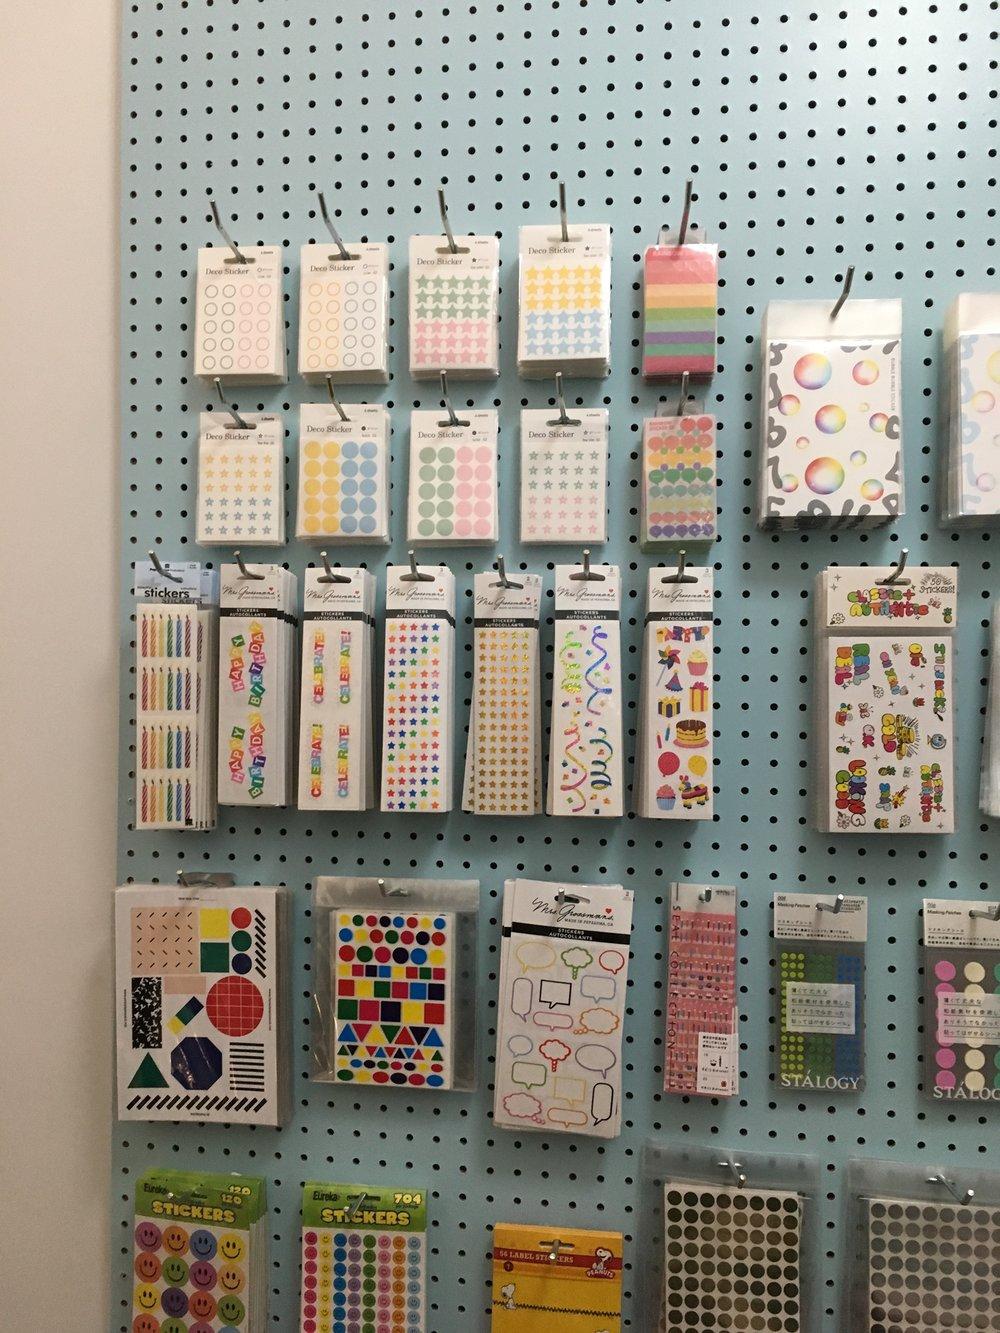 Sticker room at  CW Pencils